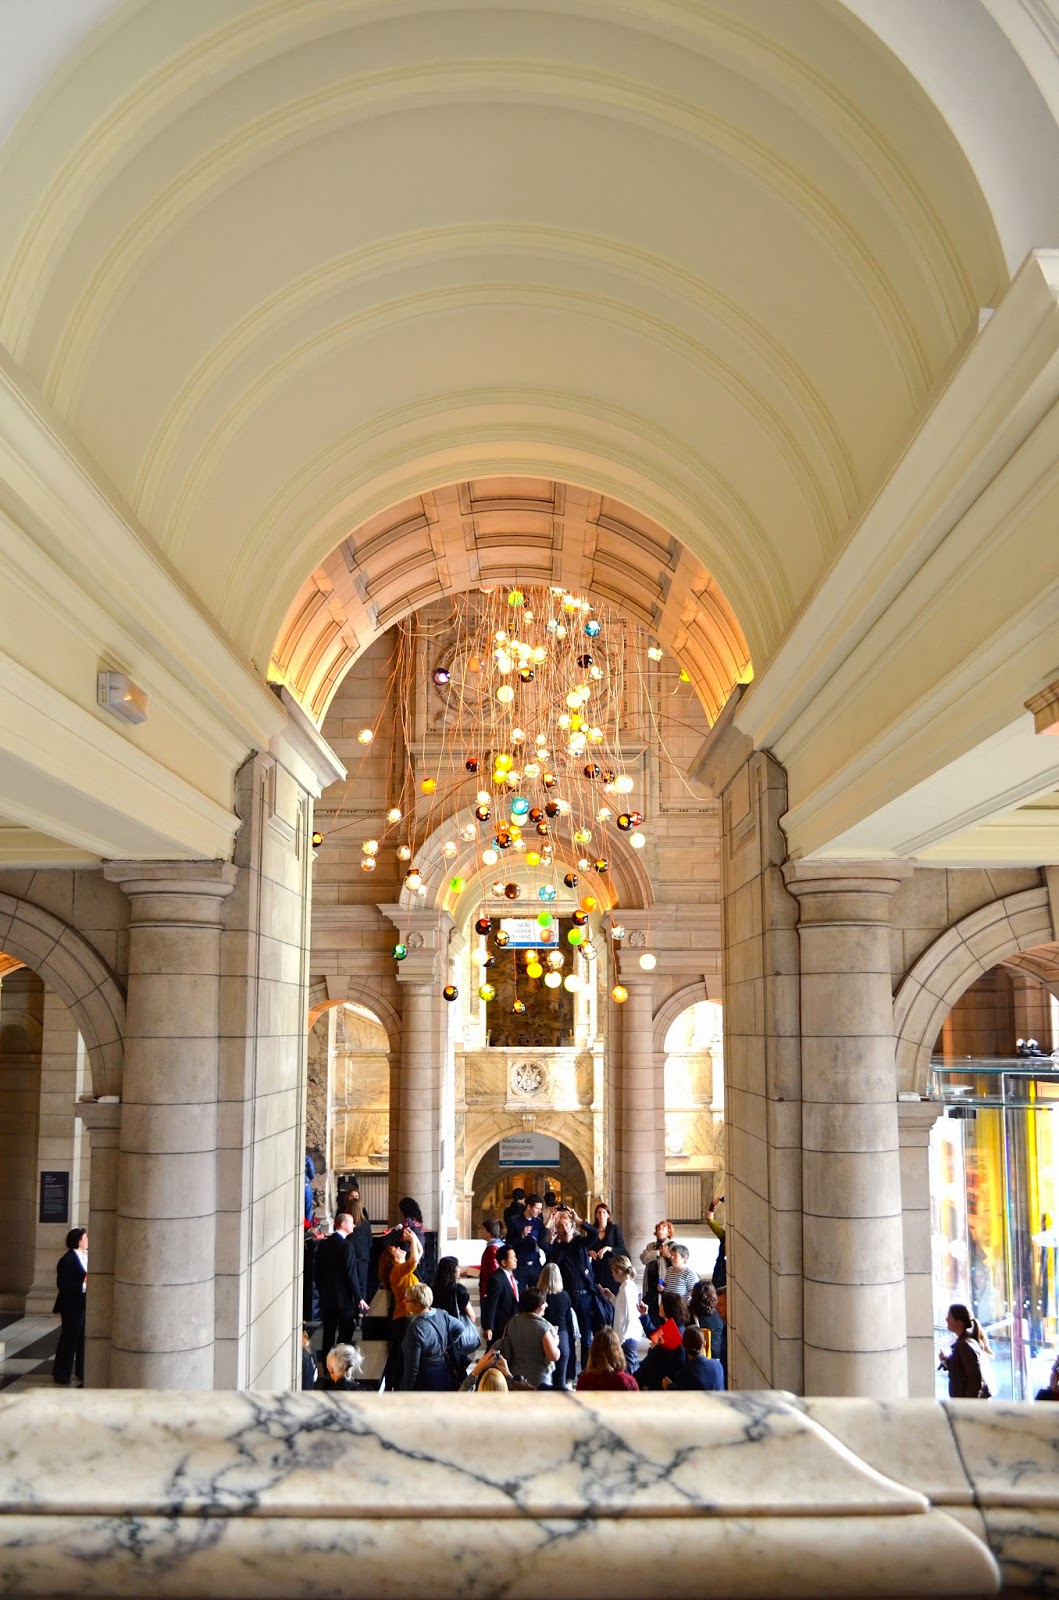 Lisa mende design victoria and albert museum london for Victoria and albert museum london